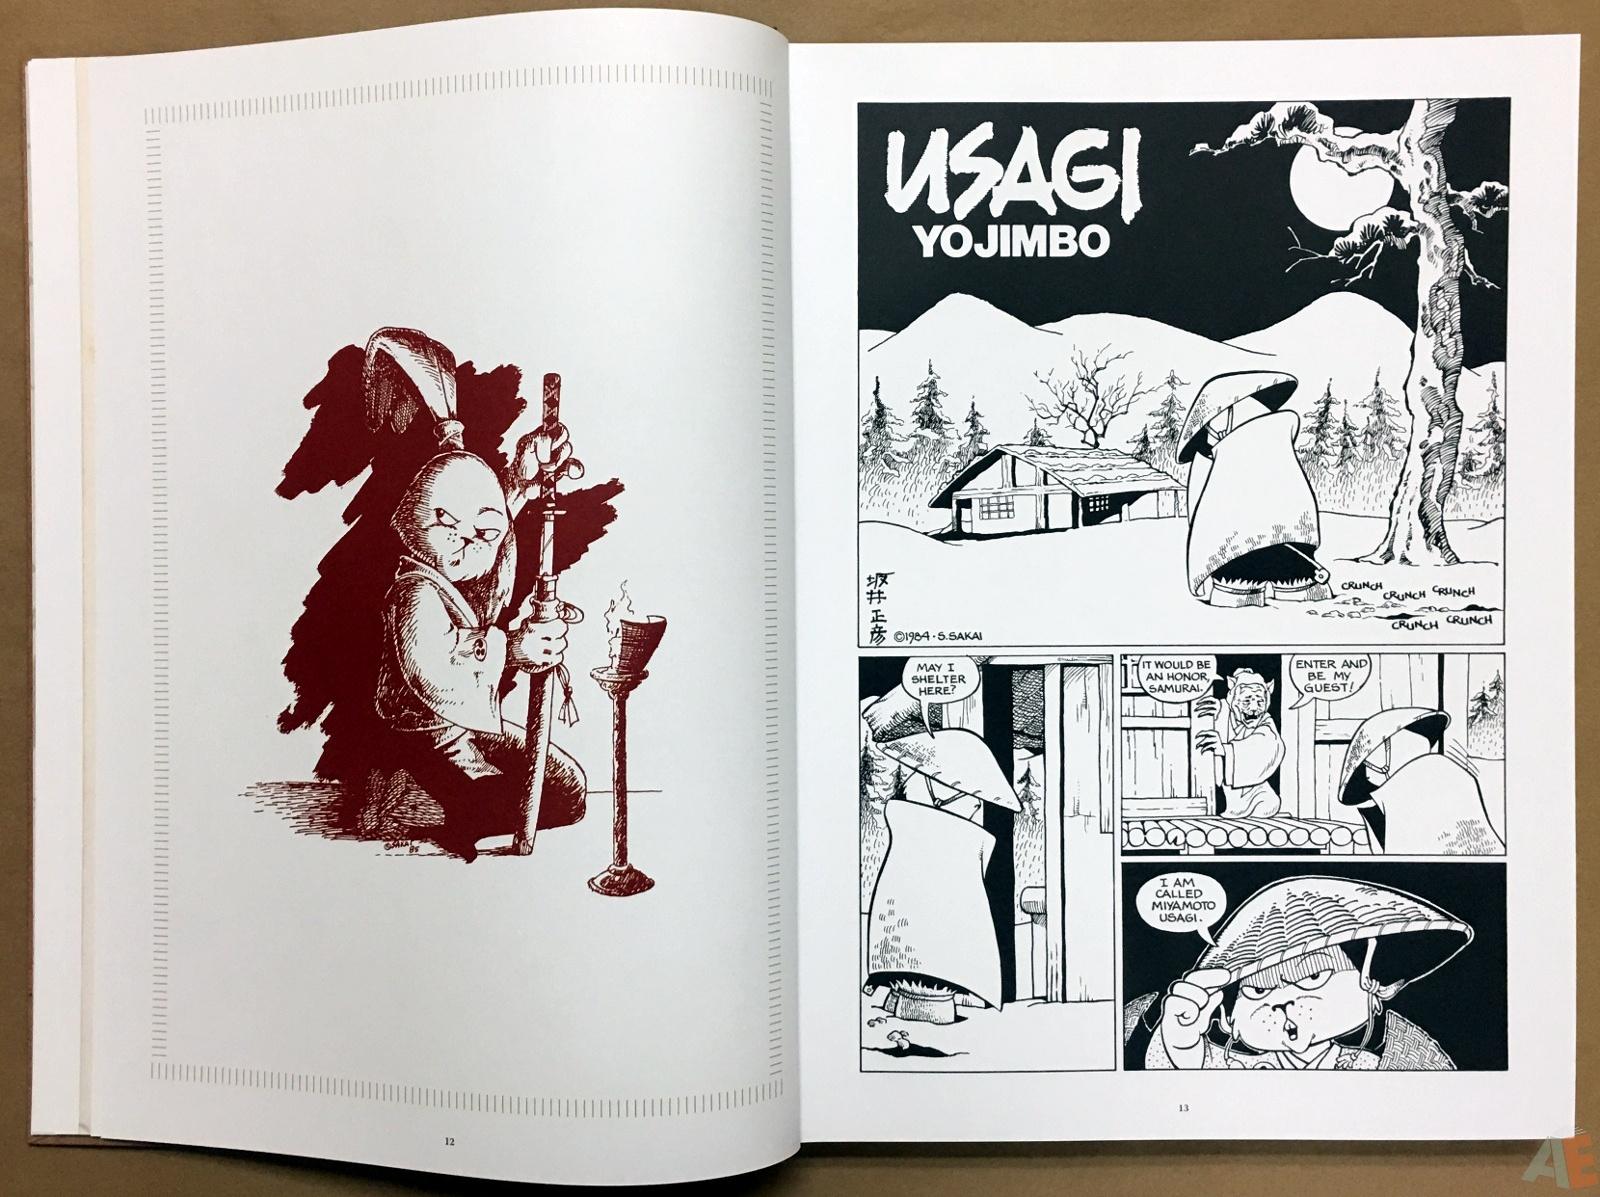 Usagi Yojimbo: Samurai and Other Stories Gallery Edition 12